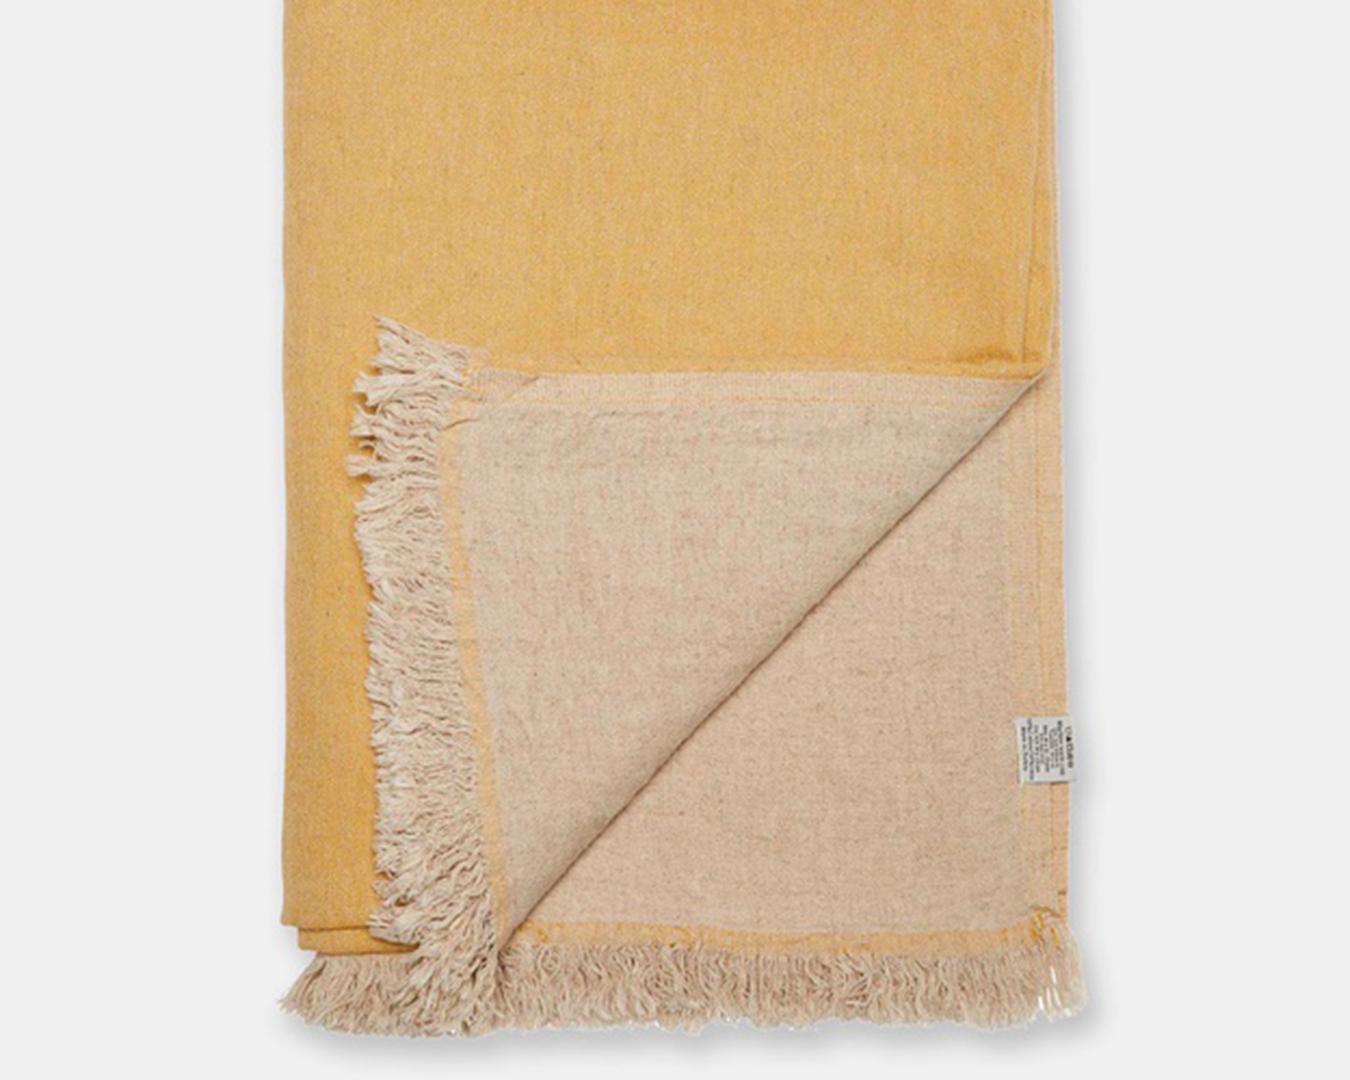 A folded mustard blanket with tassels.